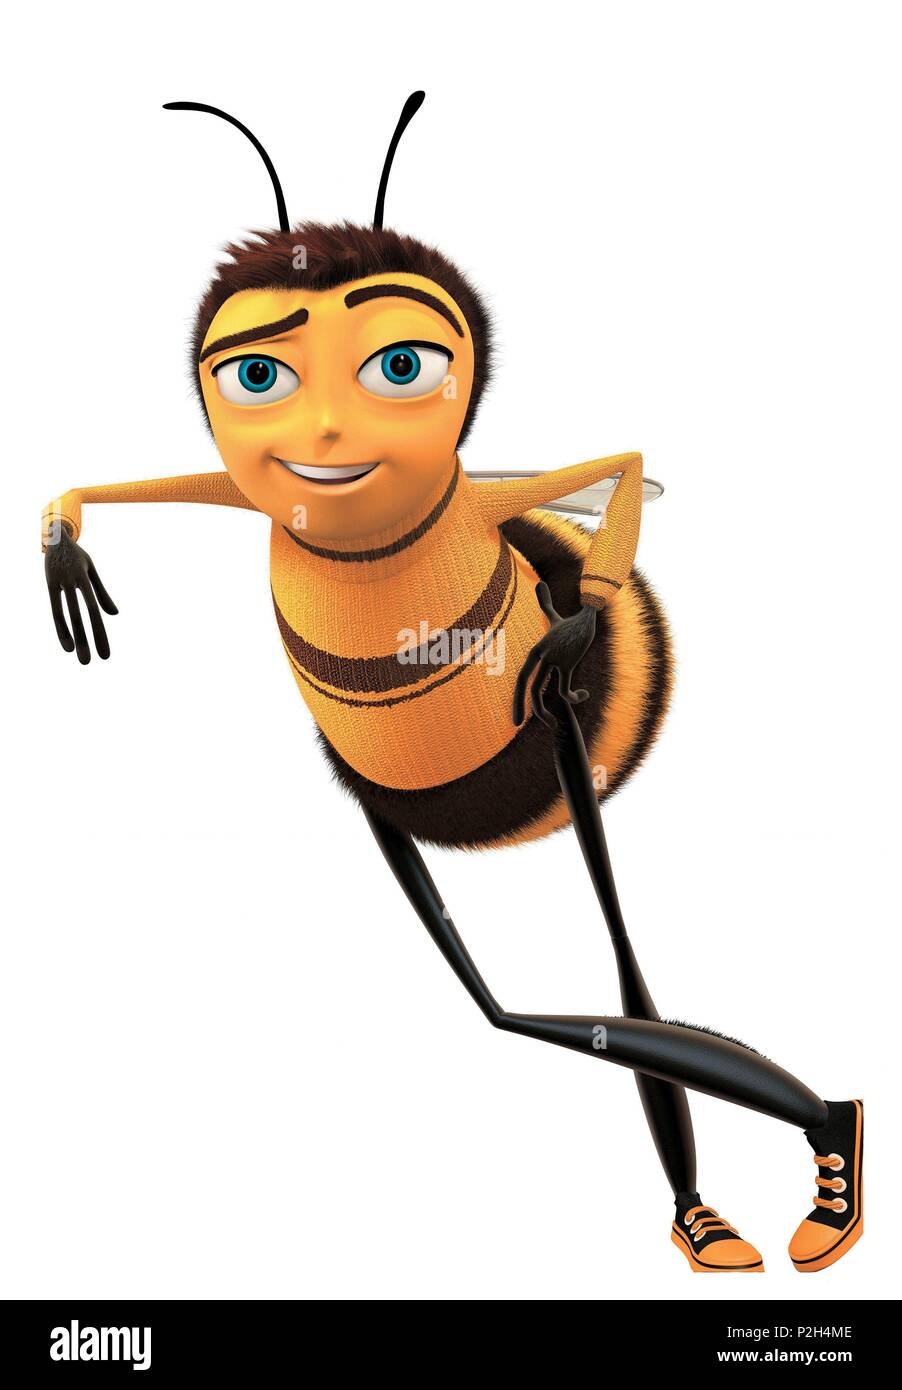 Original Film Title: BEE MOVIE.  English Title: BEE MOVIE.  Film Director: STEVE HICKNER; SIMON J. SMITH.  Year: 2007. Credit: DREAMWORKS / Album - Stock Image